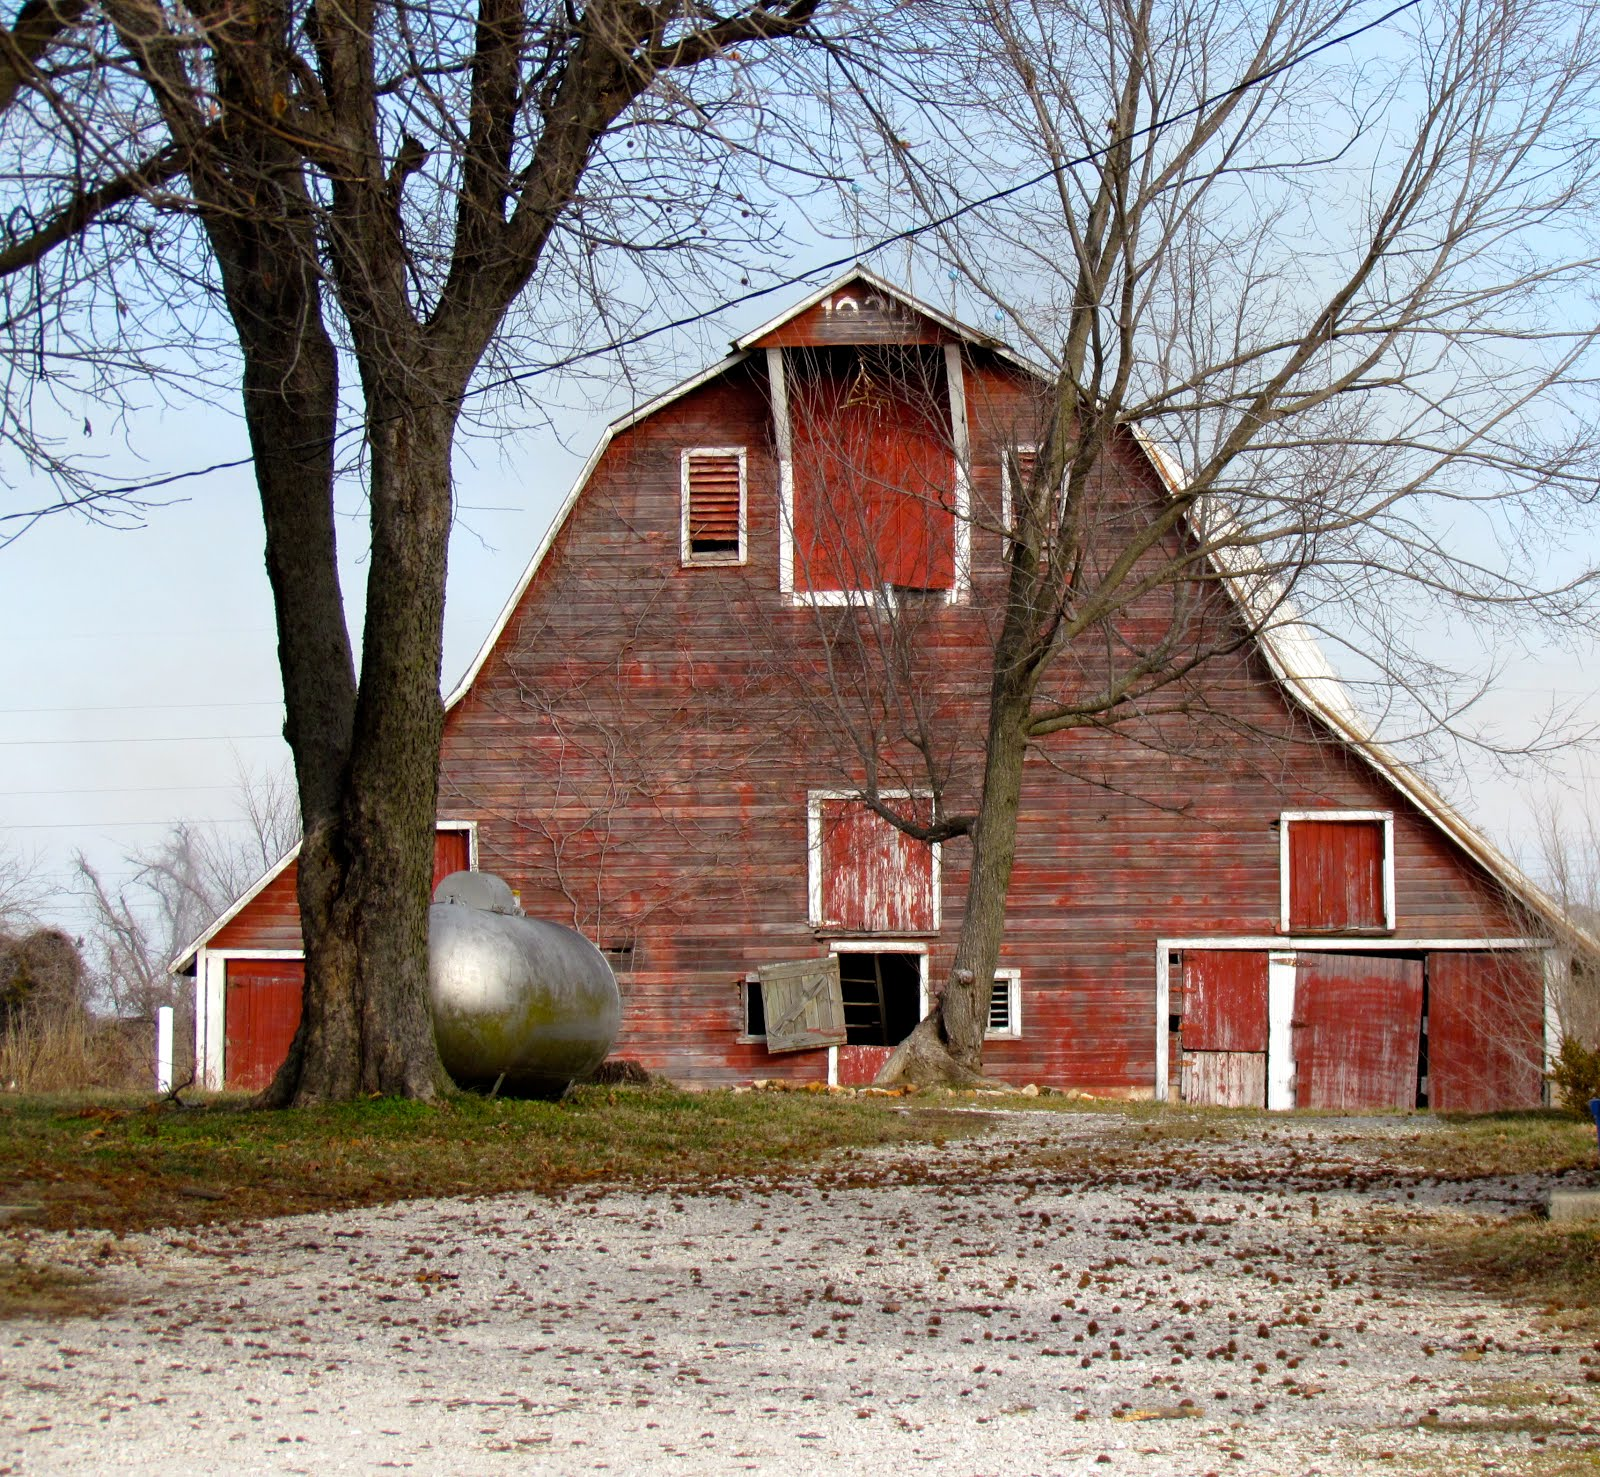 Missouri, Barns And Old Barns